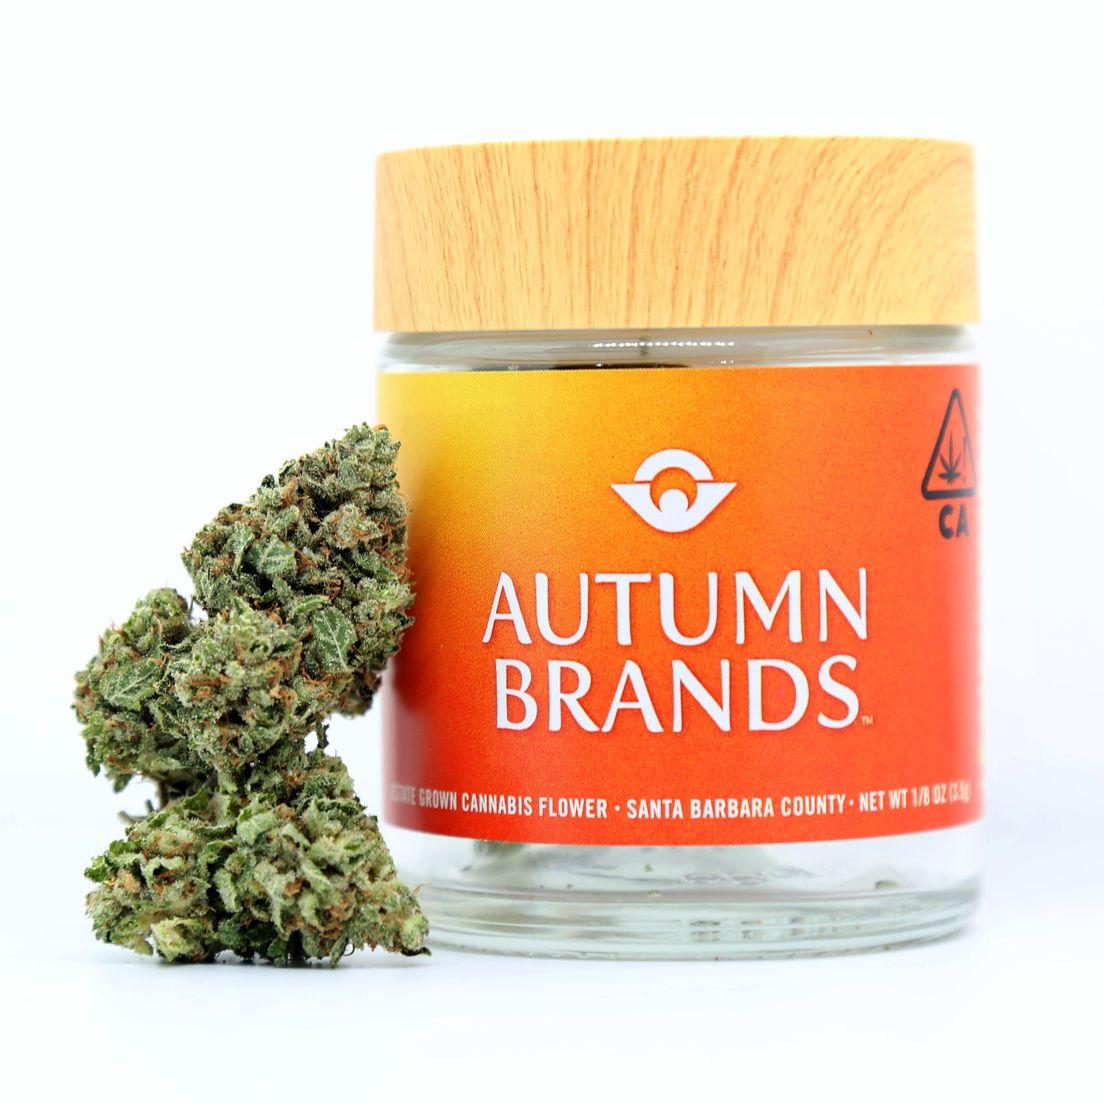 B. Autumn Brands 3.5g Flower - Quality 8/10 - Strawberry Banana (~24%)